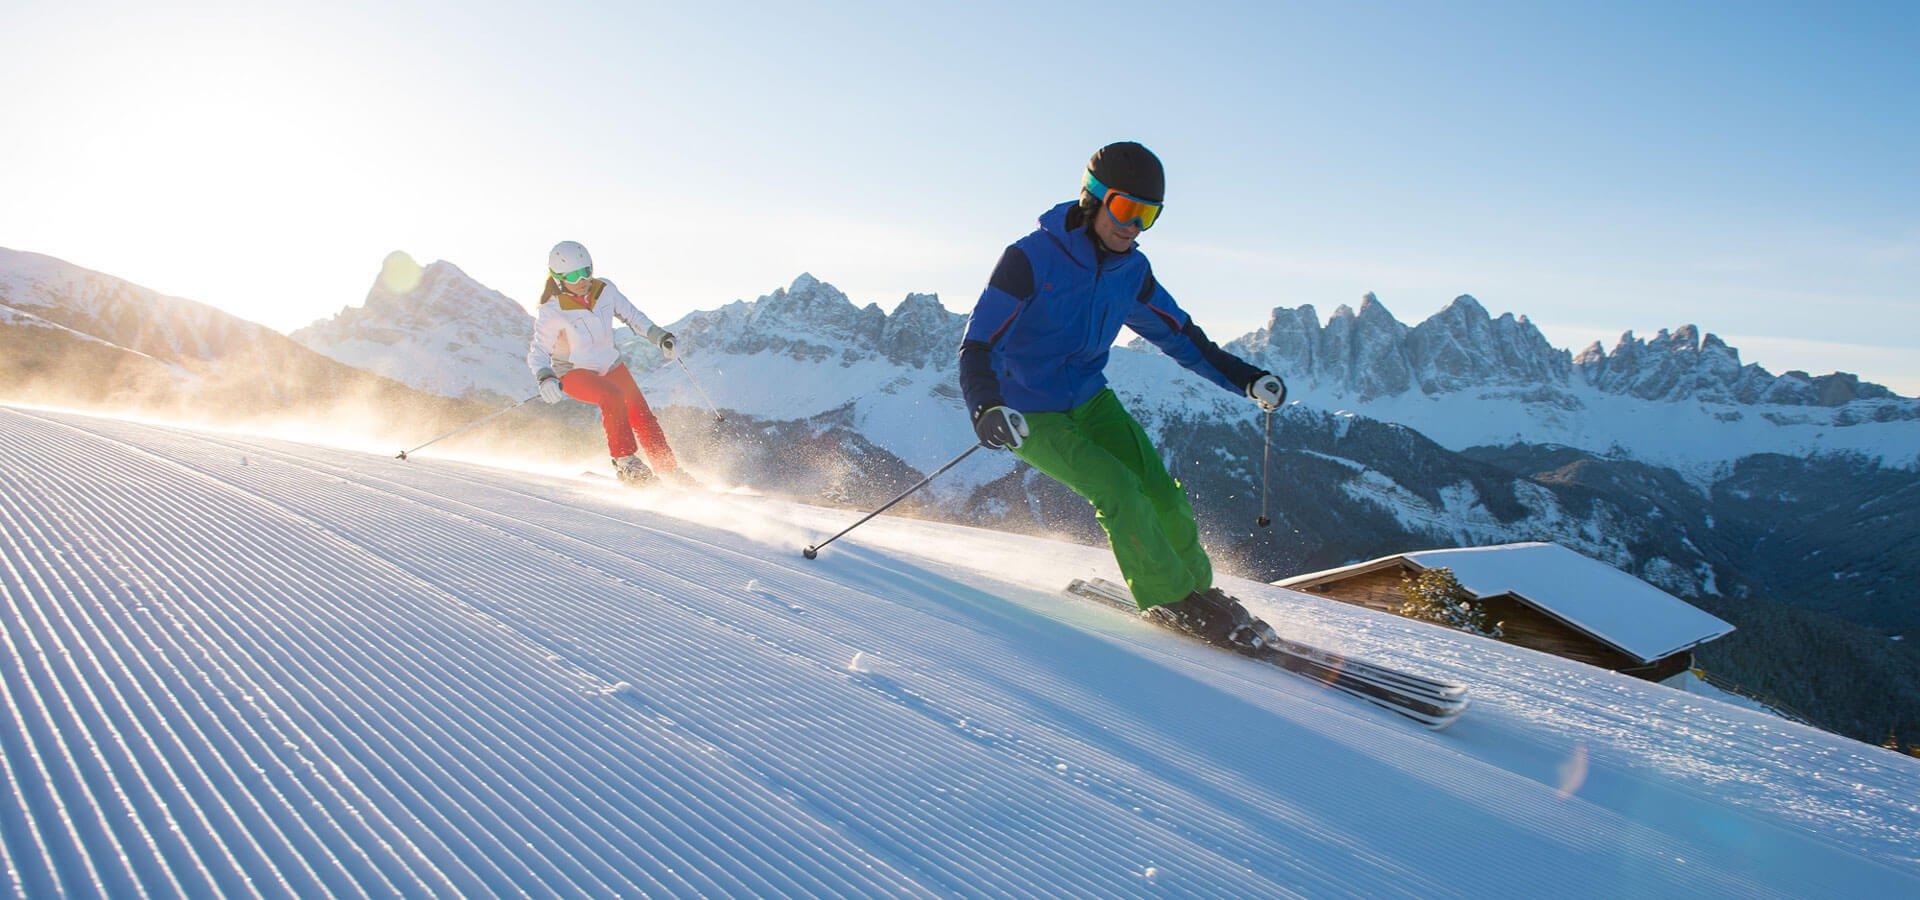 skiurlaub-plose-dolomiten